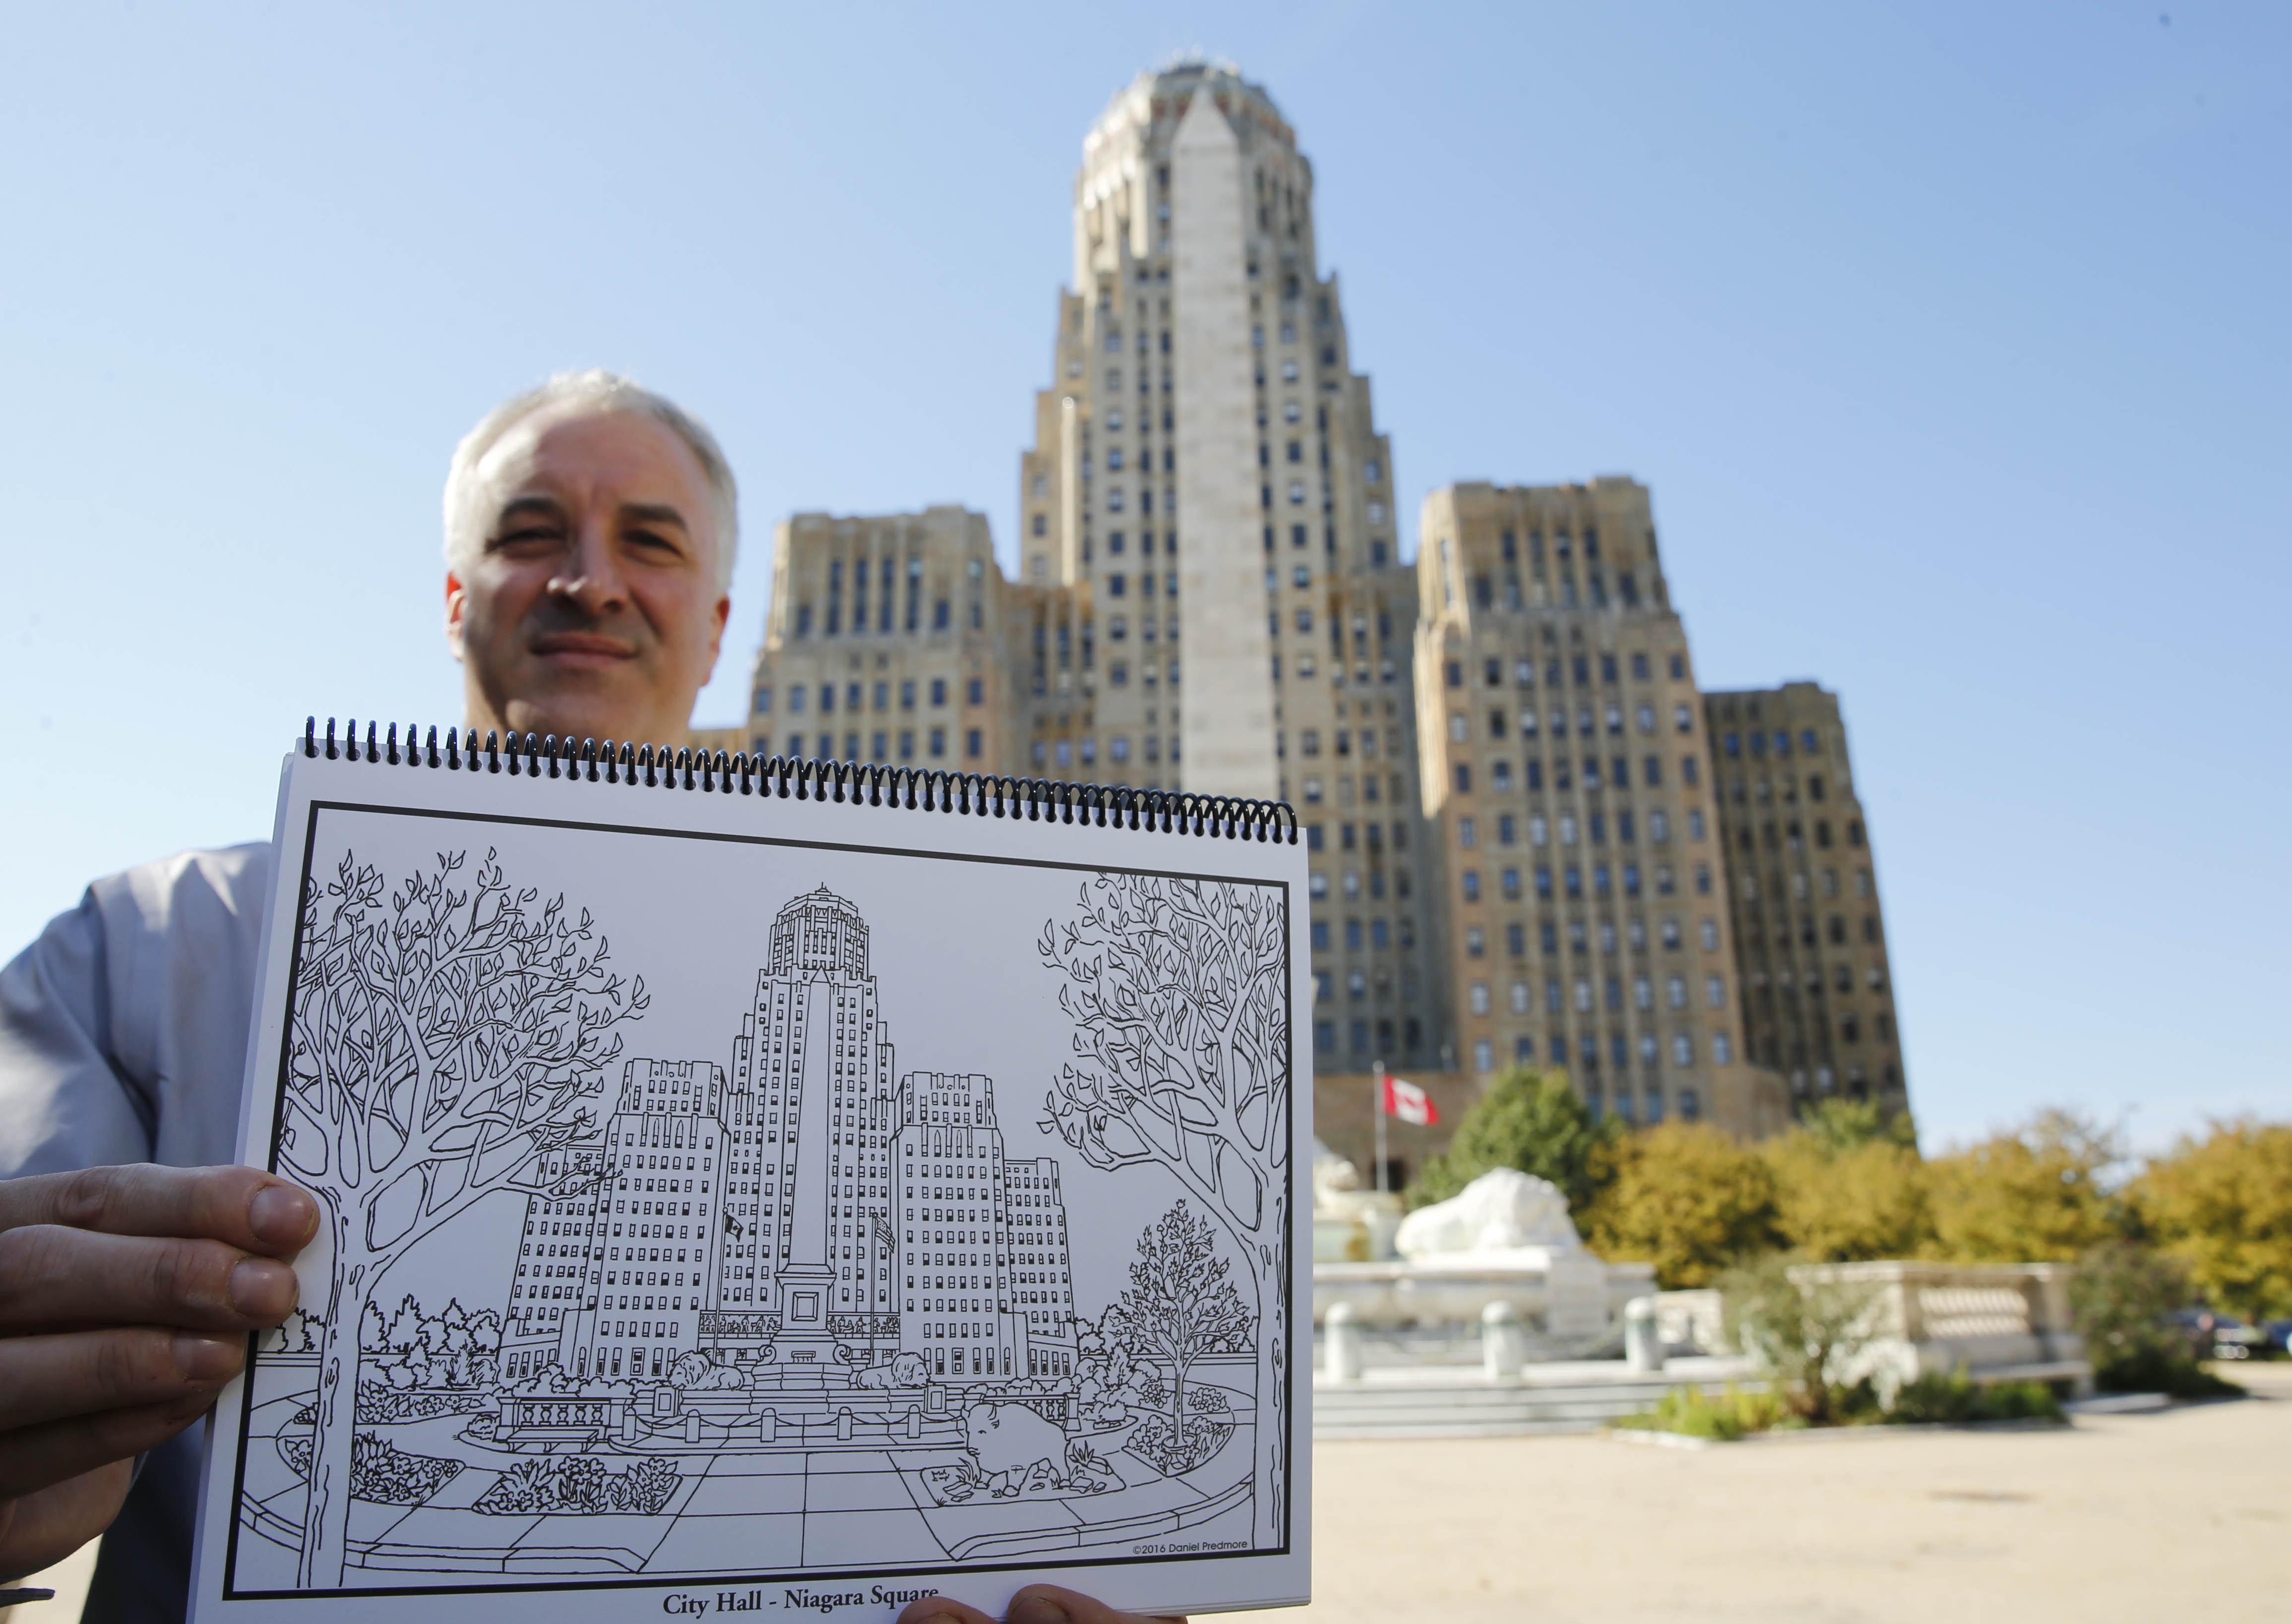 Daniel Predmore has a new coloring book featuring downtown Buffalo, Wednesday, Oct. 12, 2016.  (Derek Gee/Buffalo News)